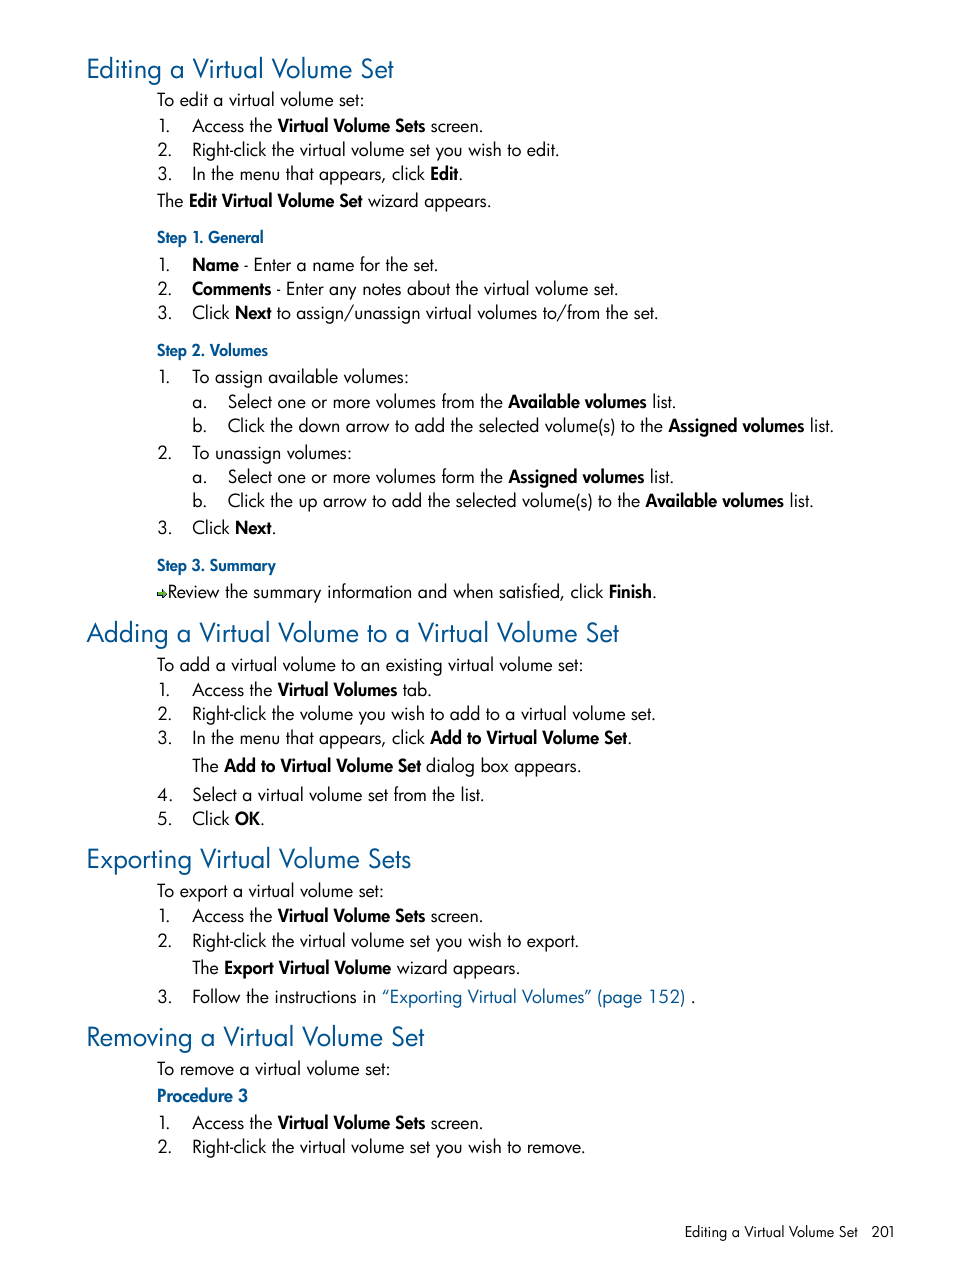 Editing a virtual volume set, Adding a virtual volume to a